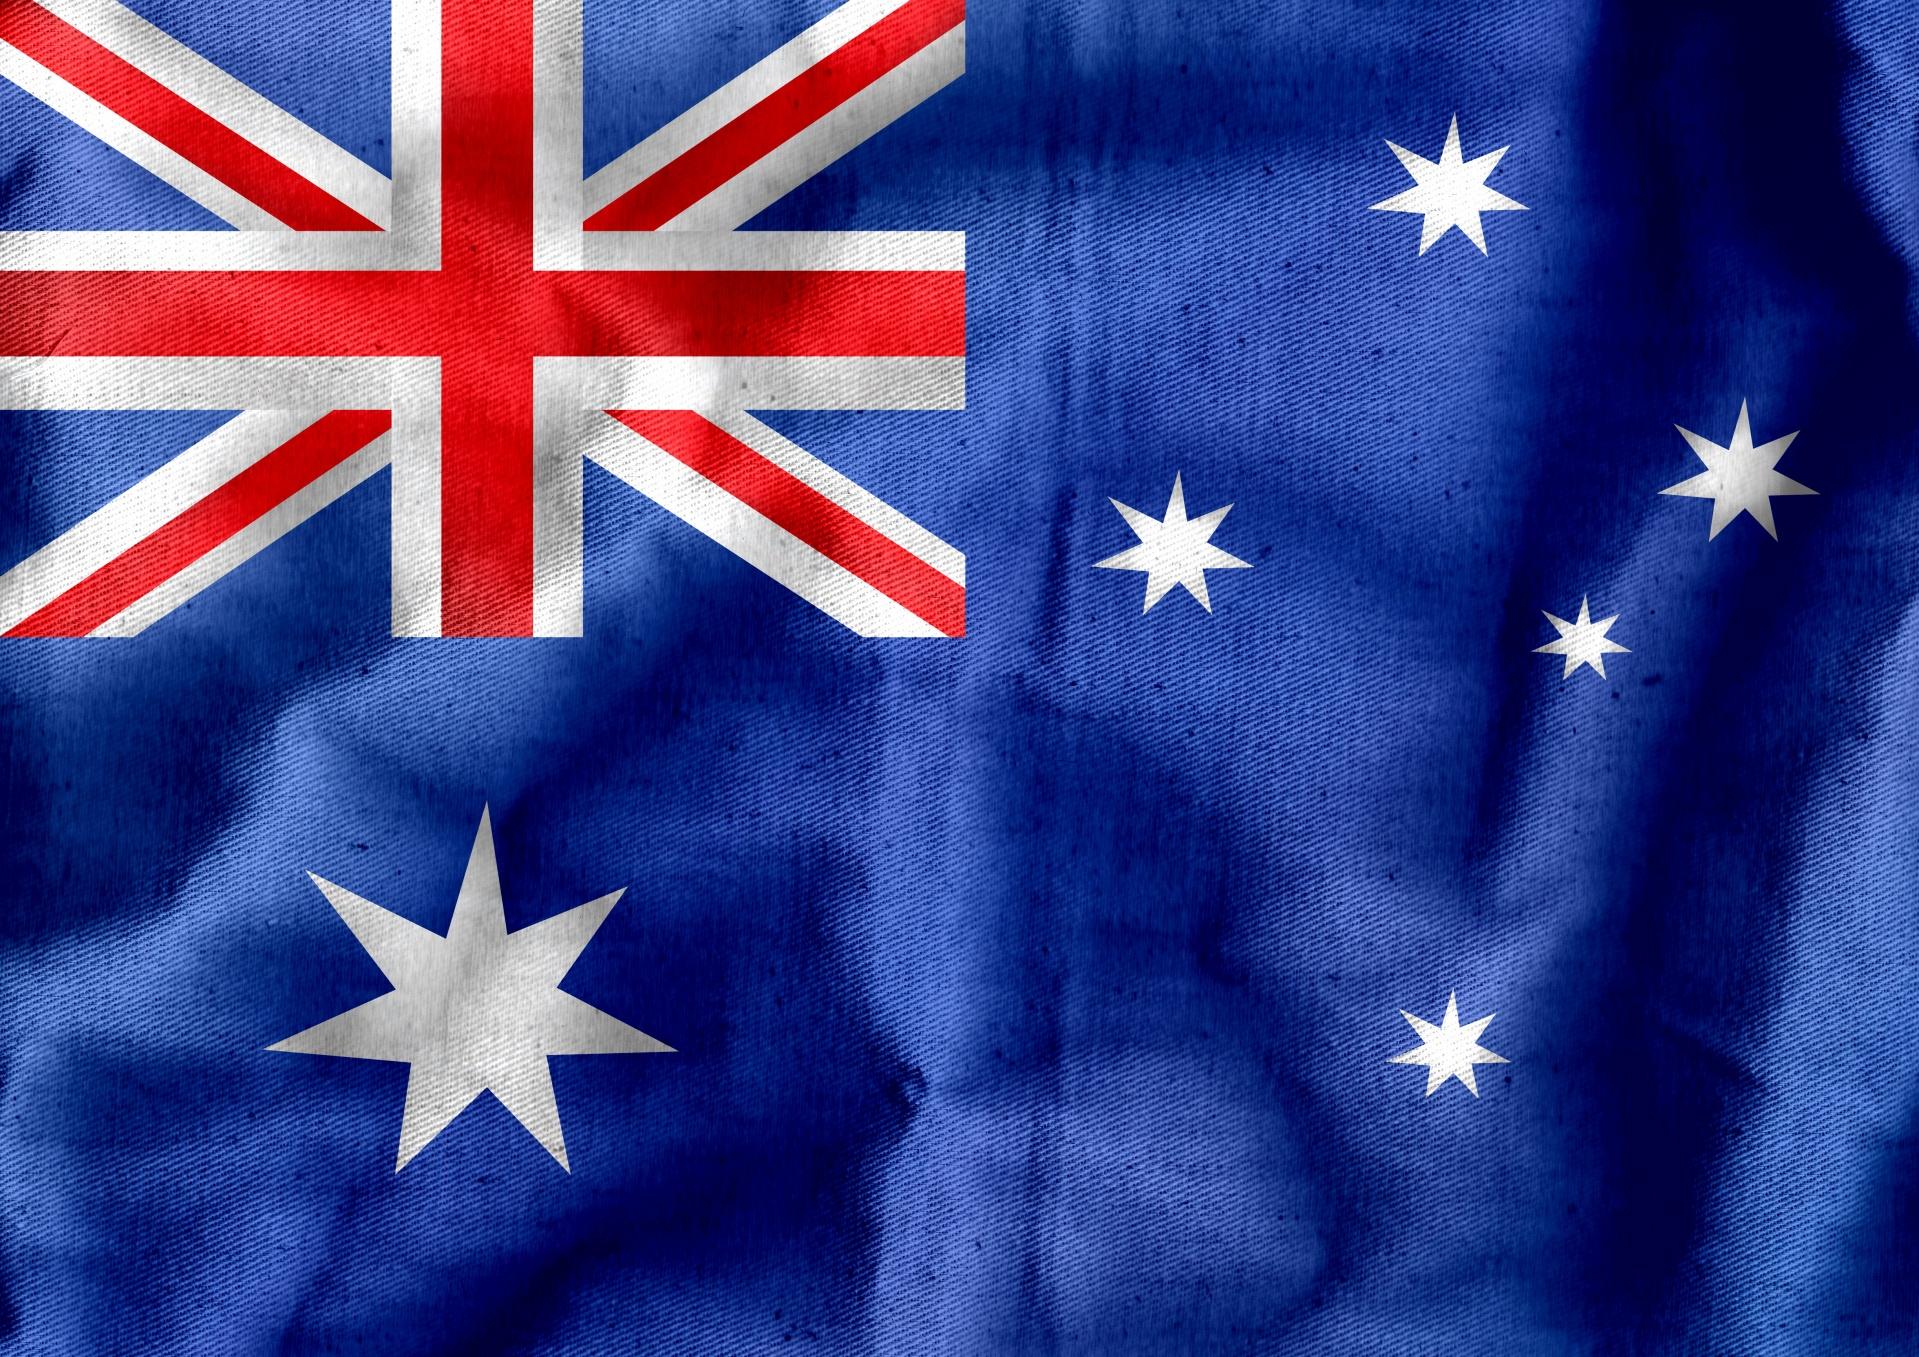 National flag of australia themes idea design 1587110424lXa Team Australia Launches Olympic Swimwear Sponsored by Speedo 8211 SwimSwam